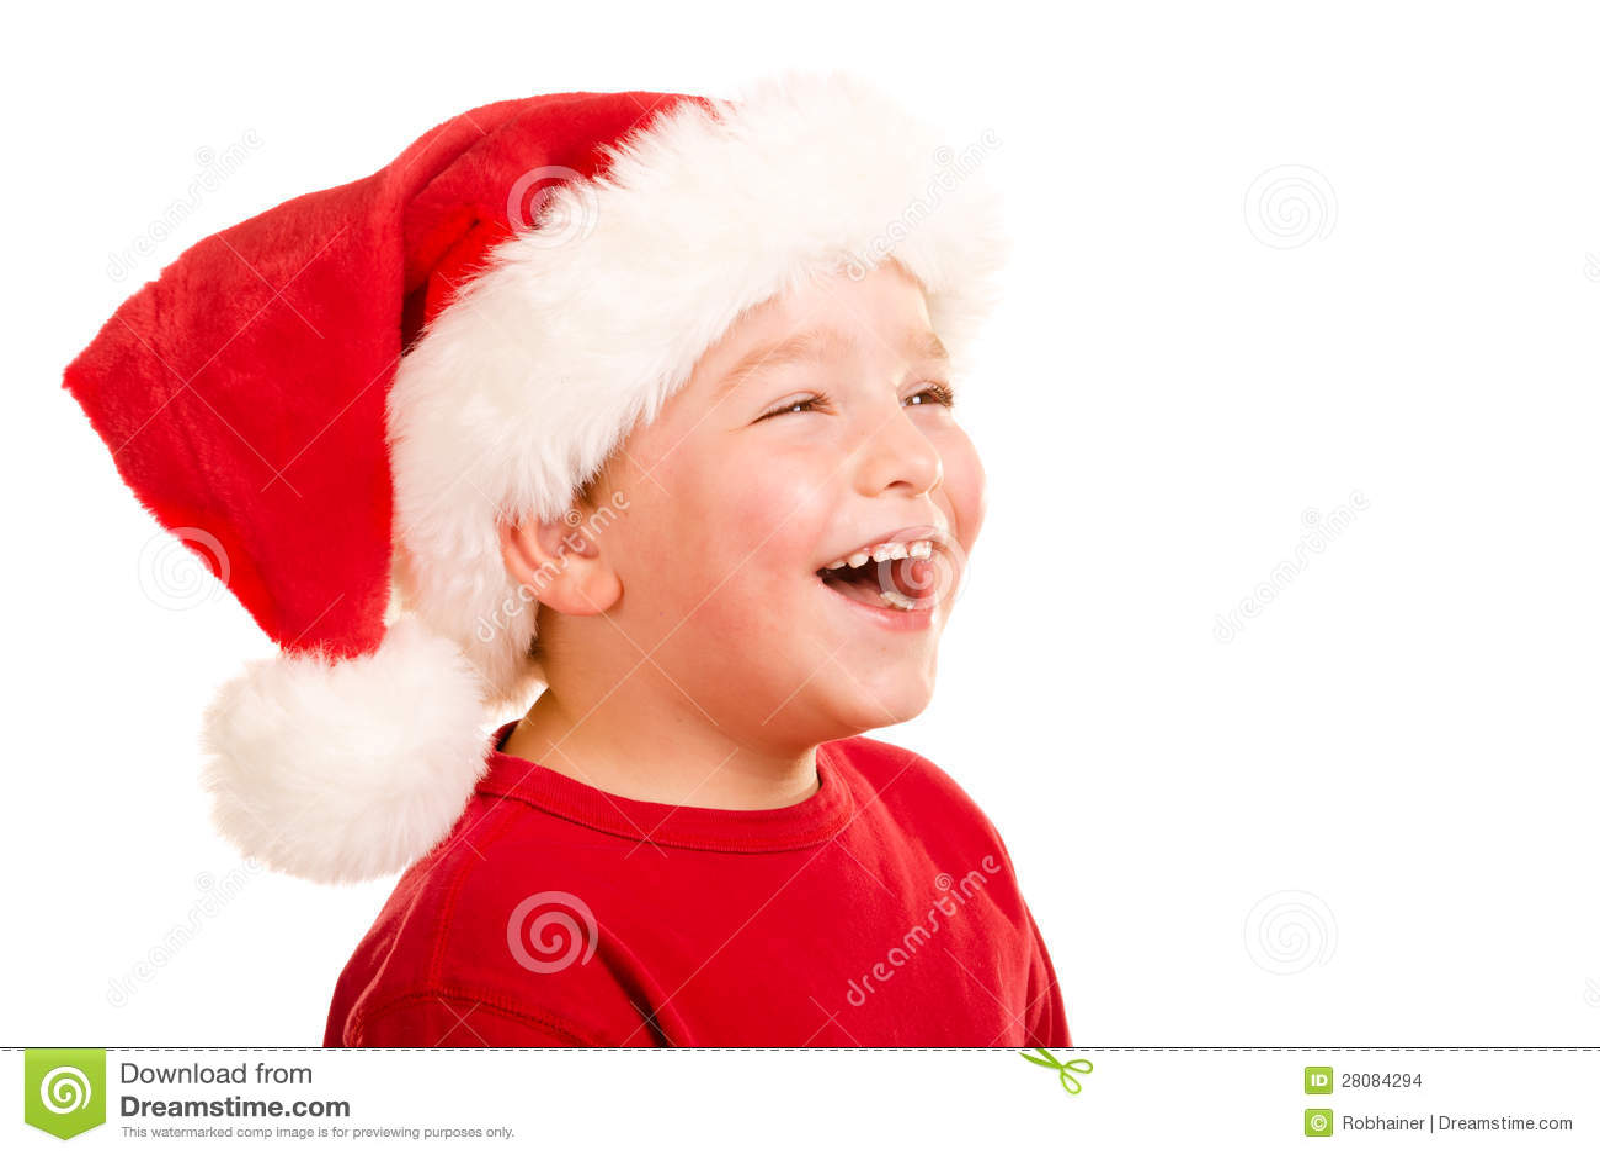 c0b5cbd161b Portrait Of Child Wearing Santa Hat Stock Photo - Image of portrait ...